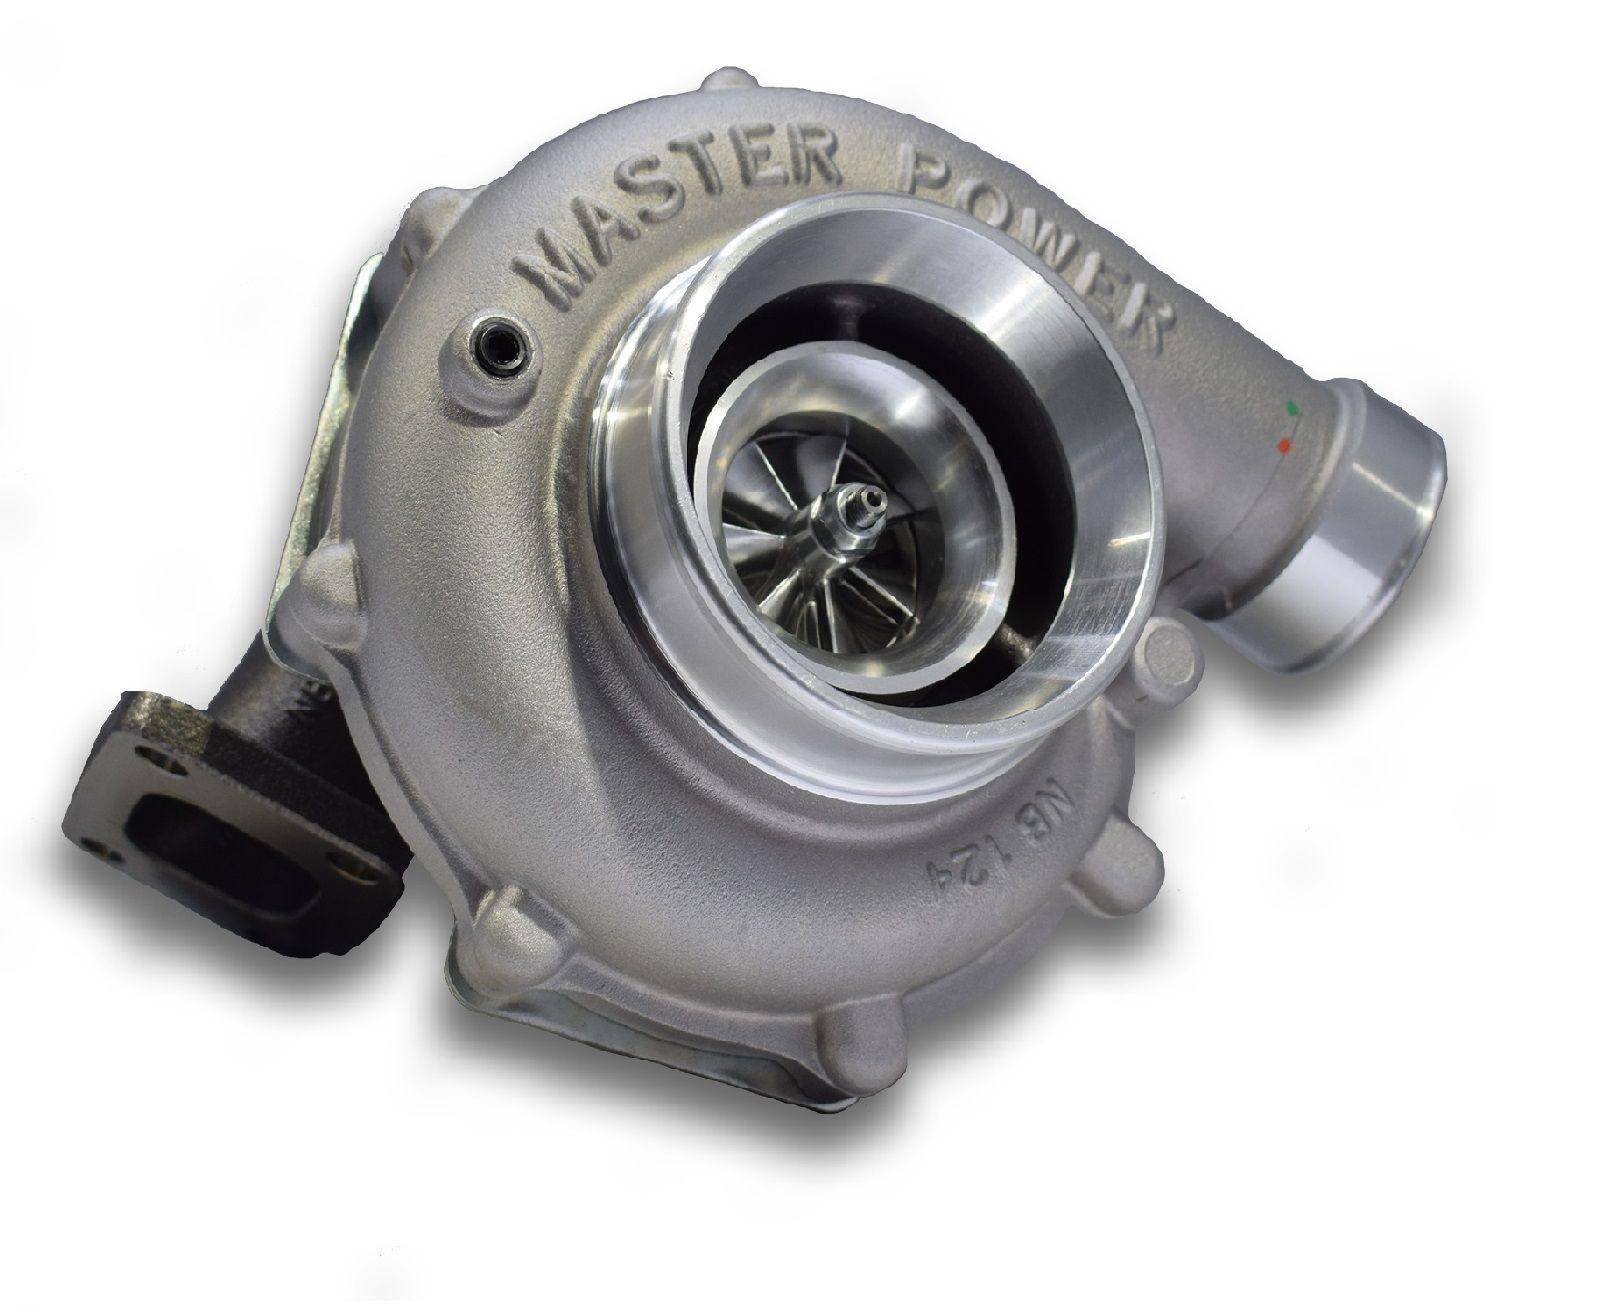 Turbo R 474